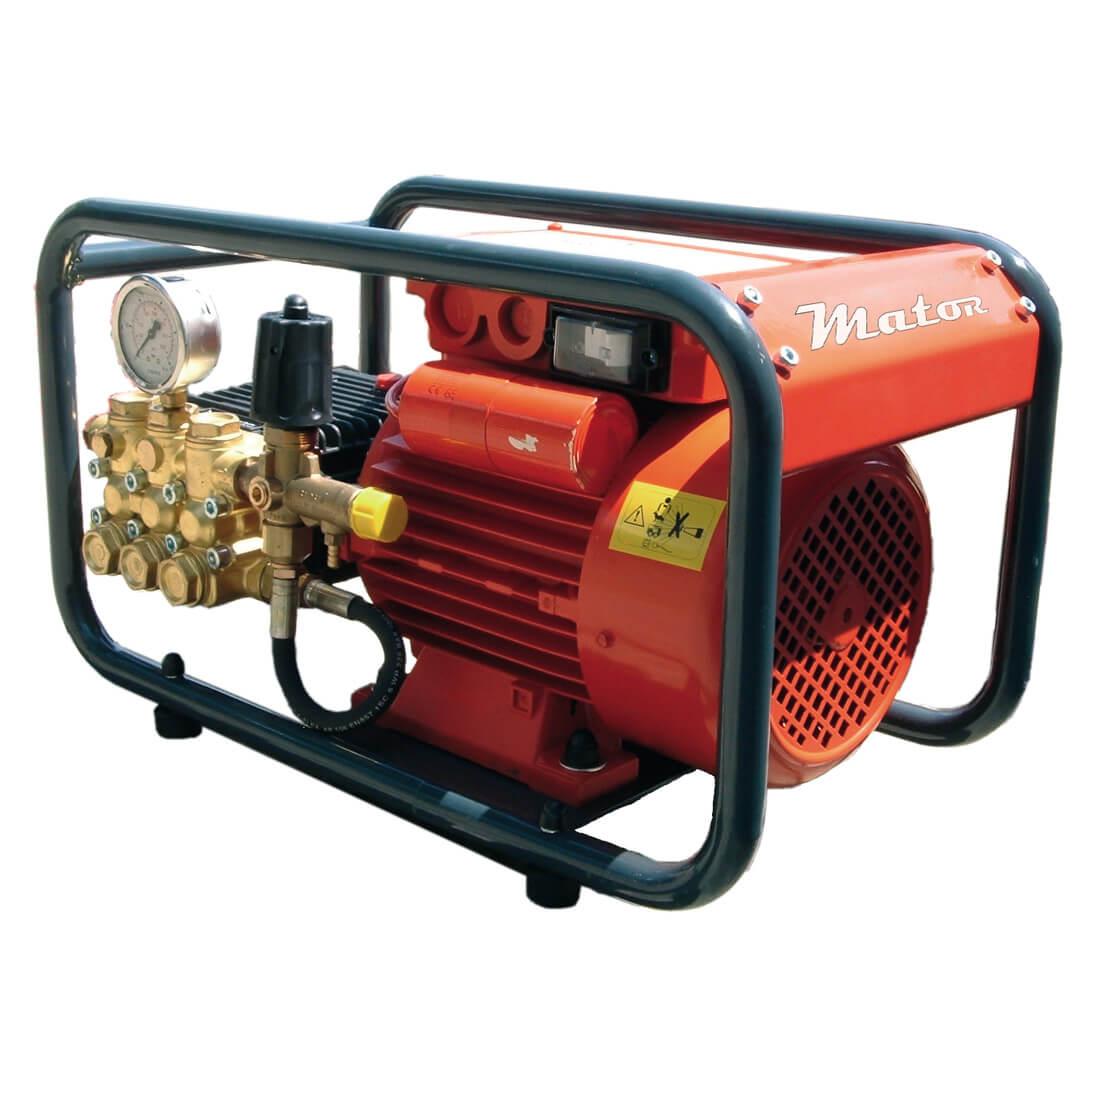 Alquiler-Hidrolimpiadora agua fría 190 bar, 620 L/h, 3.500W, 230v